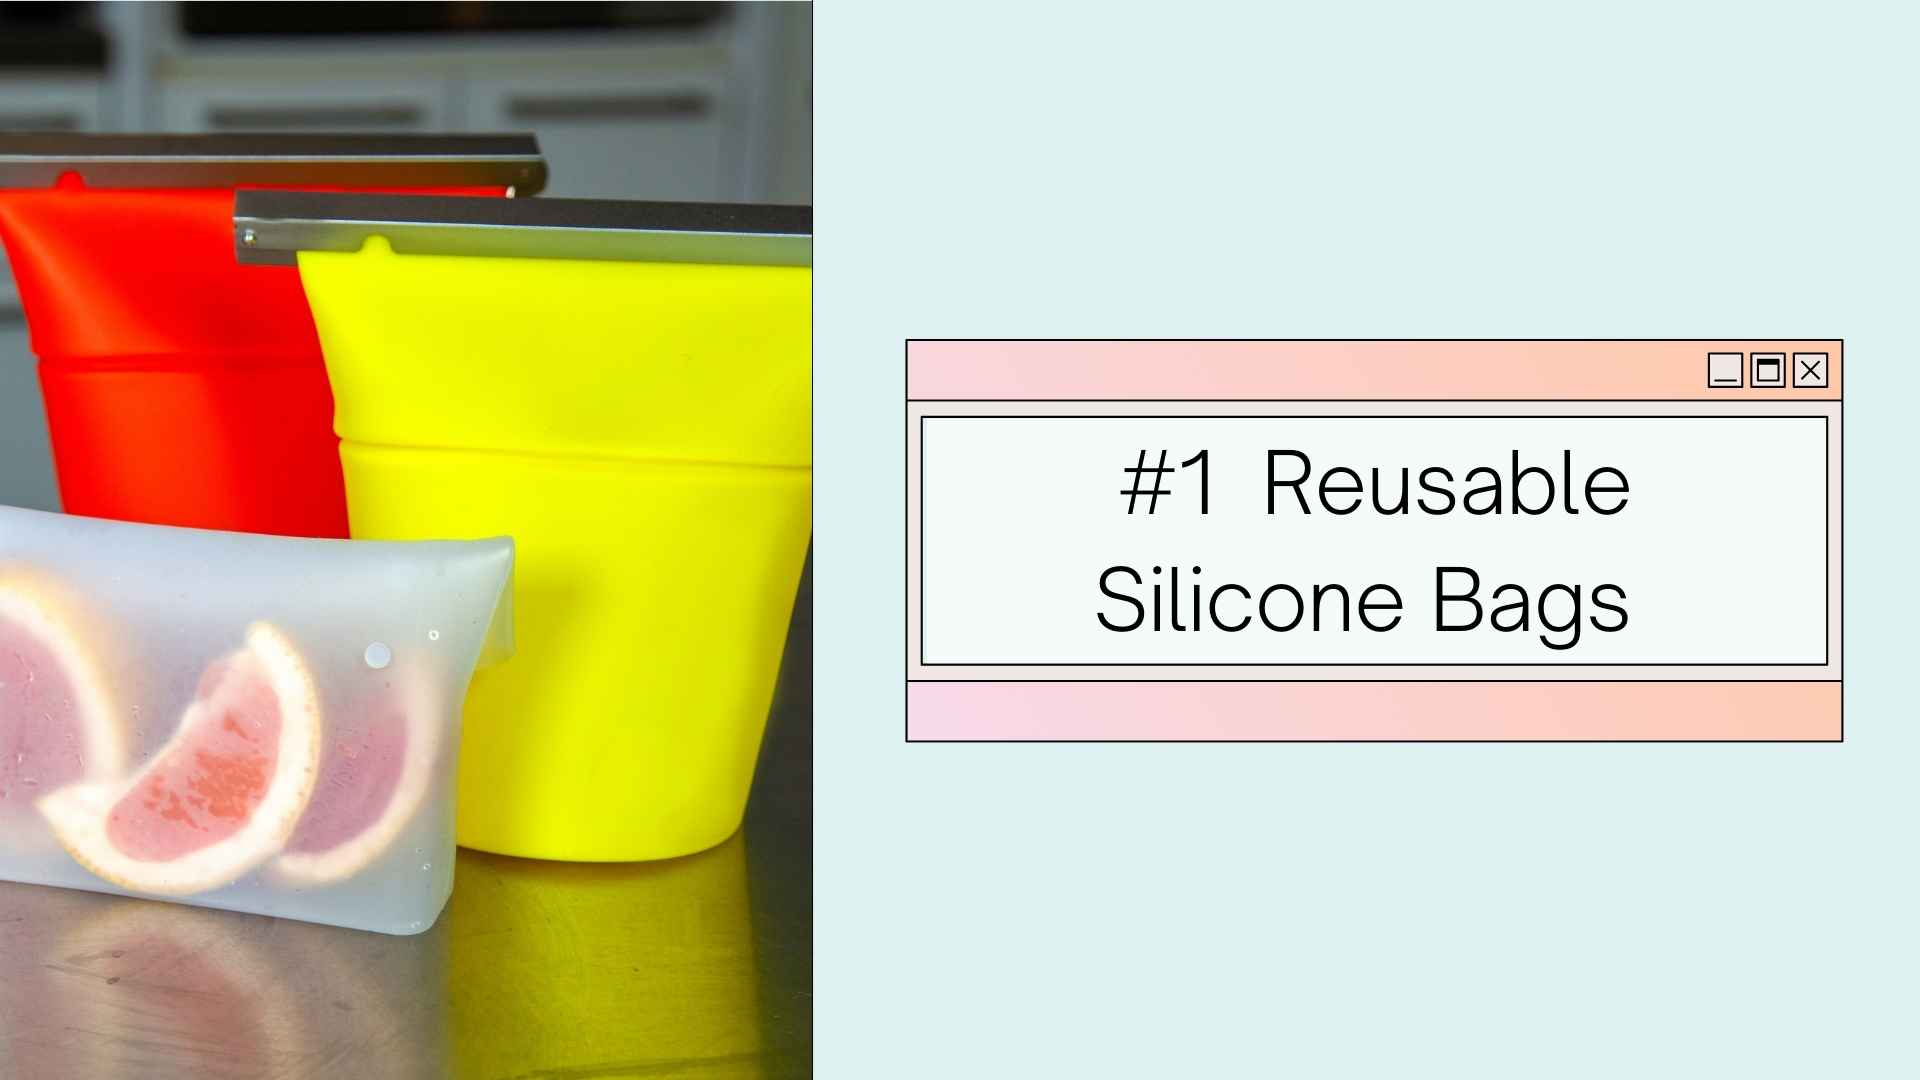 reusable silicone bags